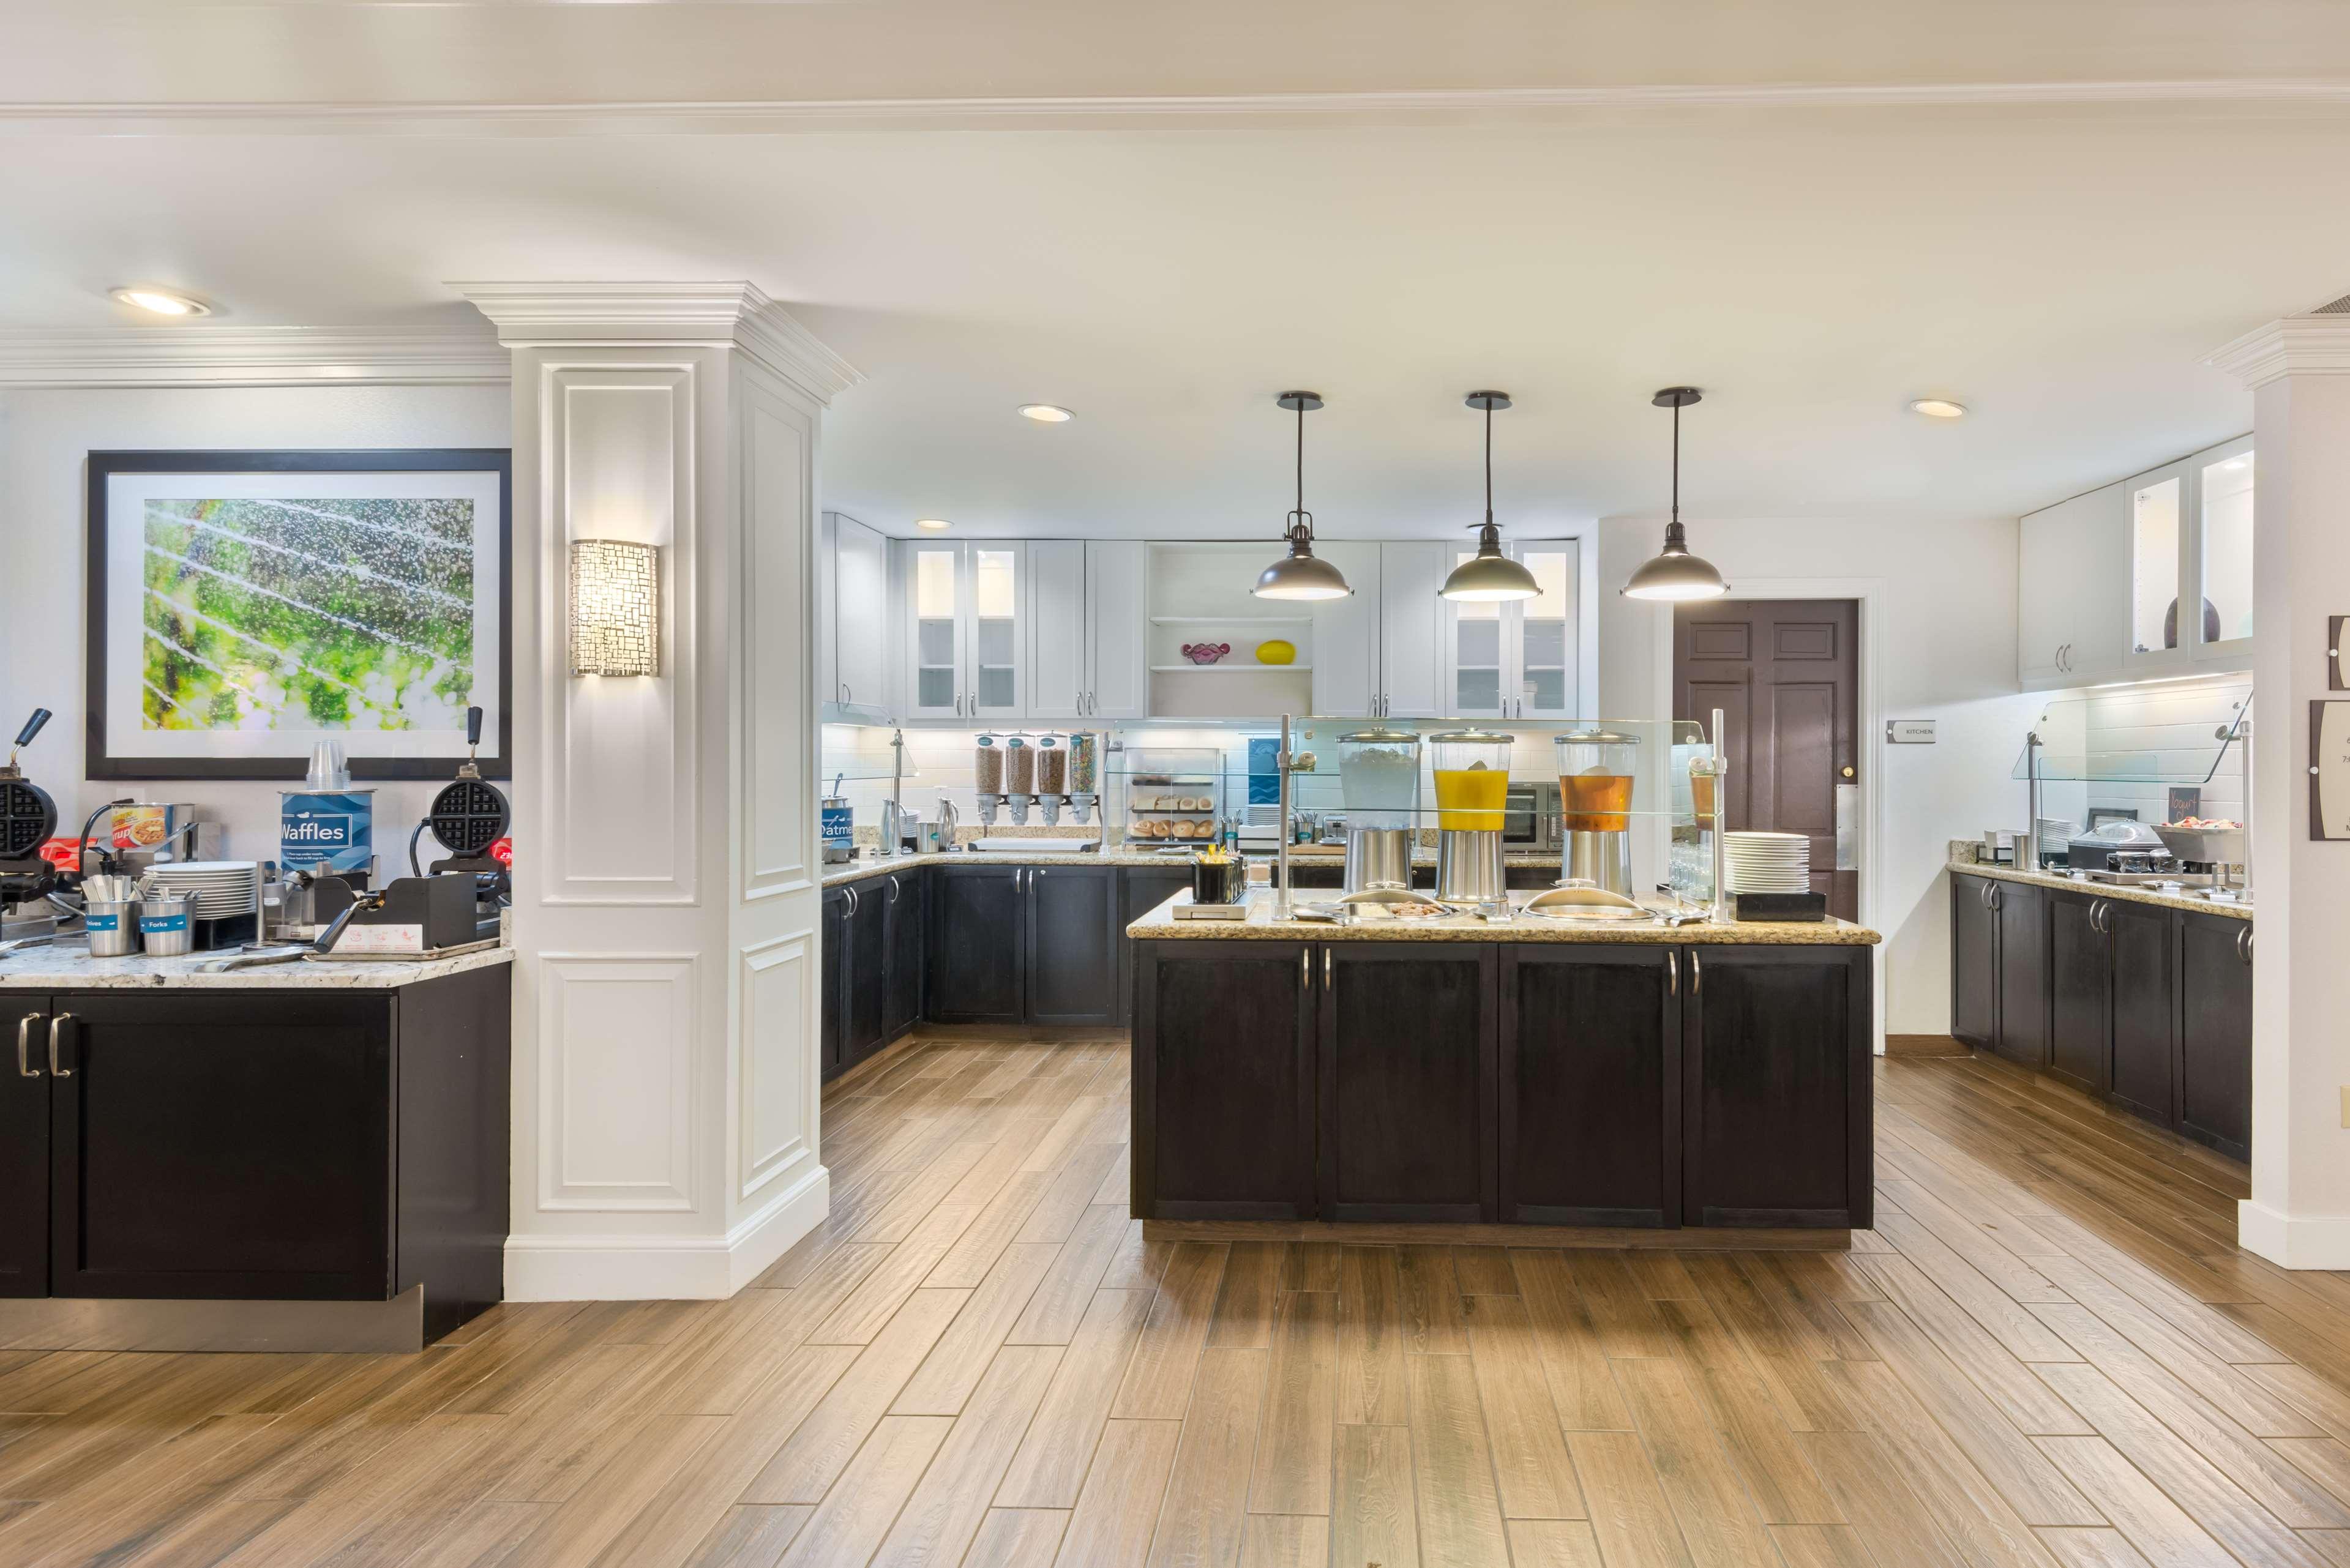 Homewood Suites by Hilton Charlotte-North/Univ Research Park image 6